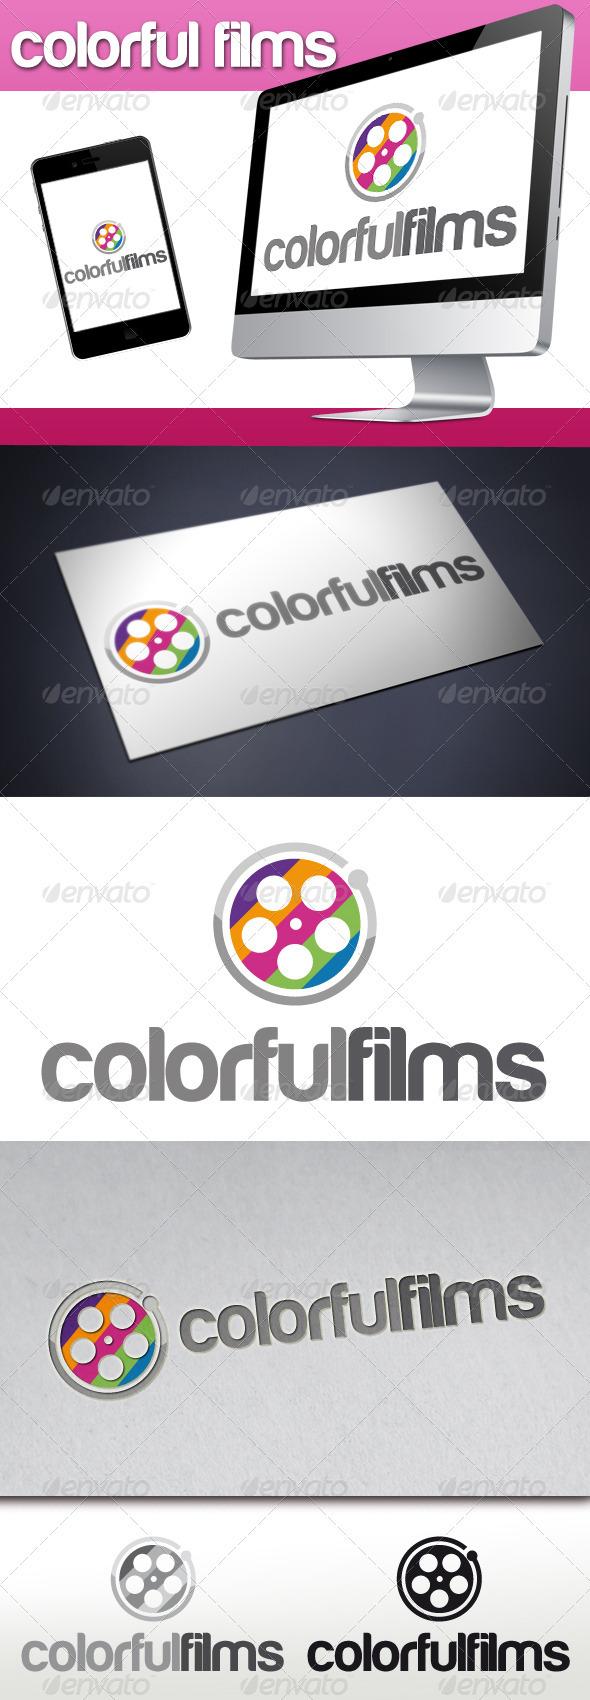 Colorful Films Logo